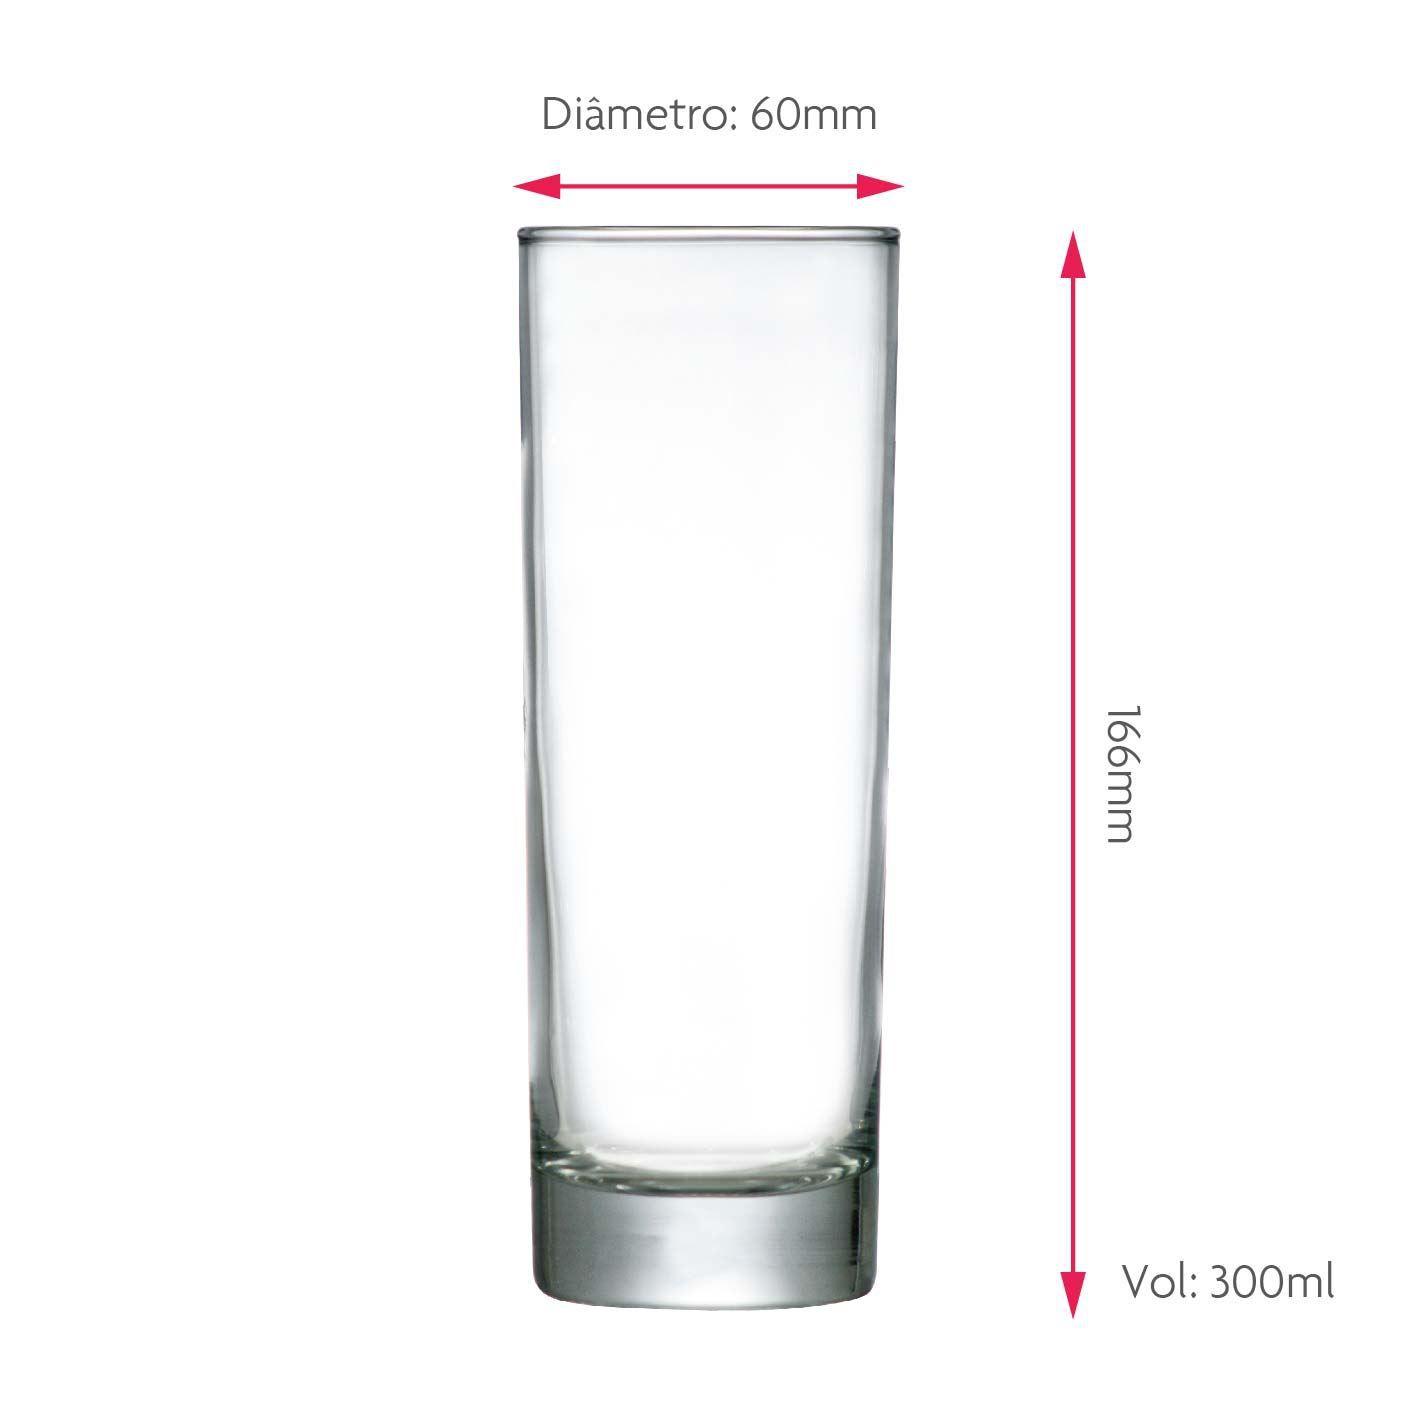 Copo de Água Frases Legais Embelezol Tubo 300ml